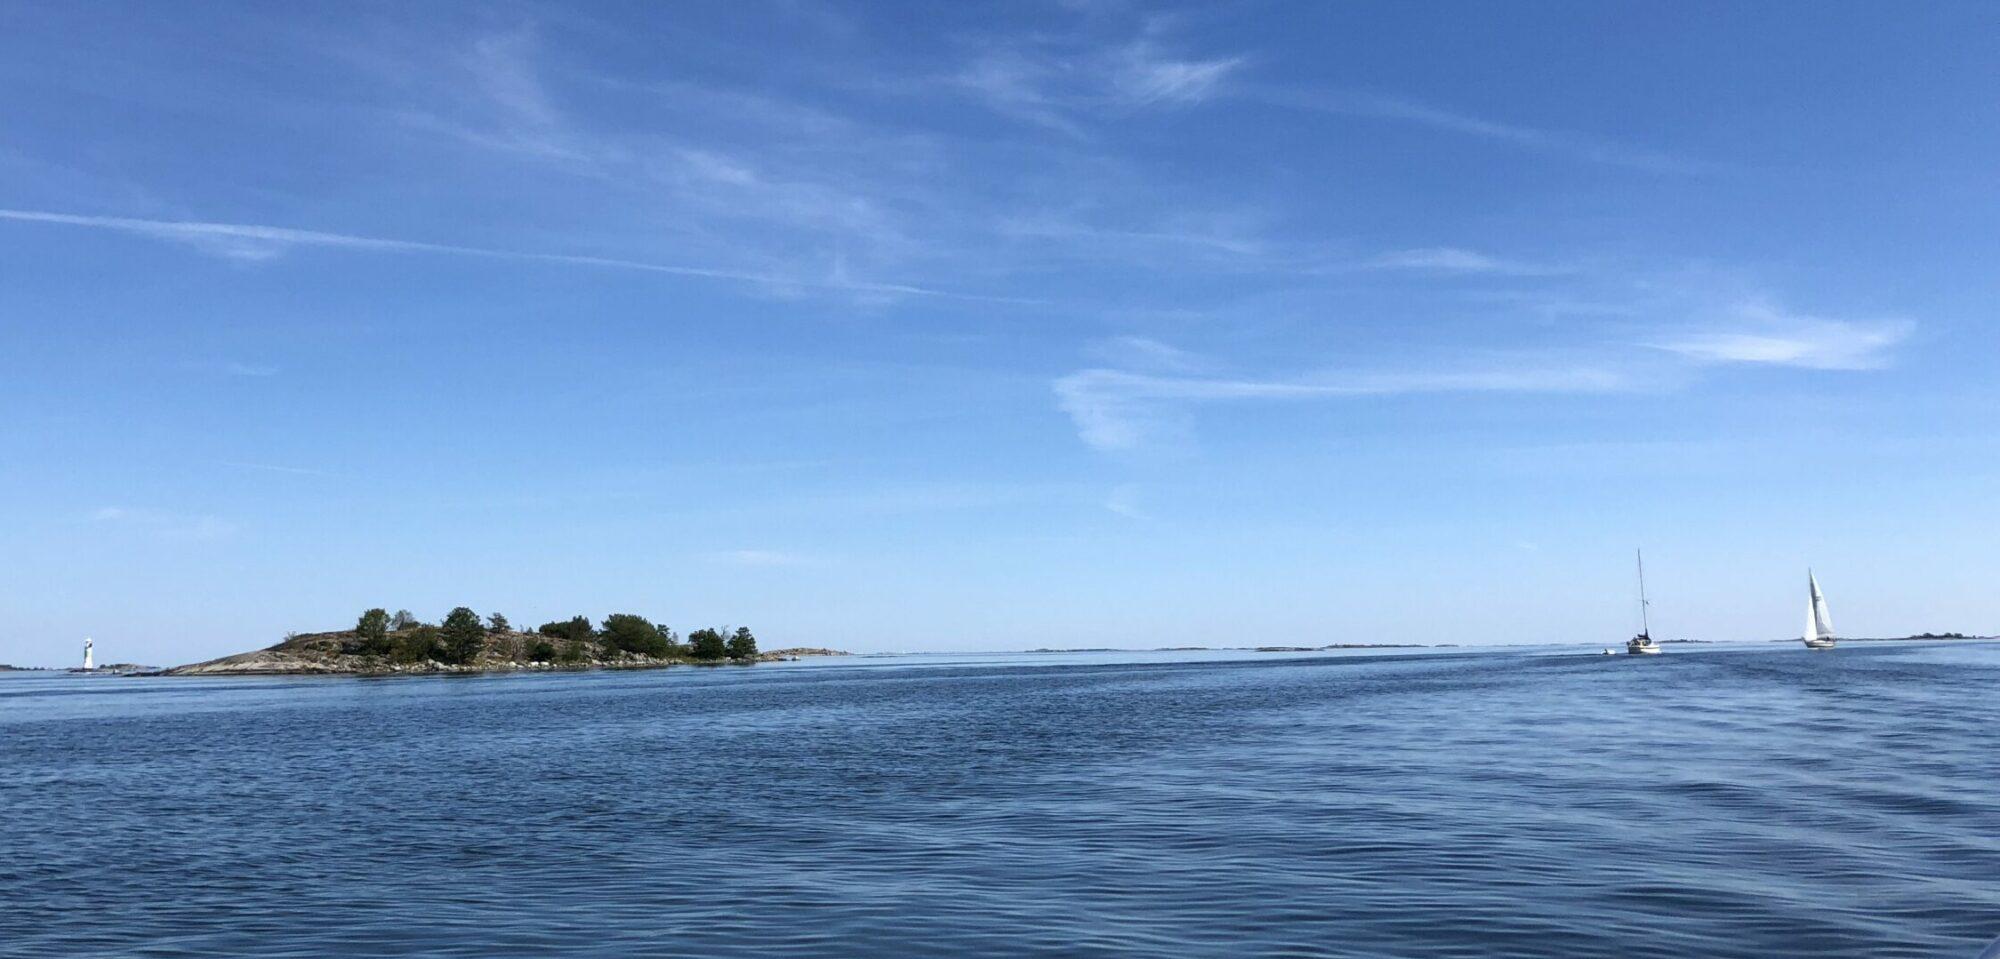 Björkviks båtklubb